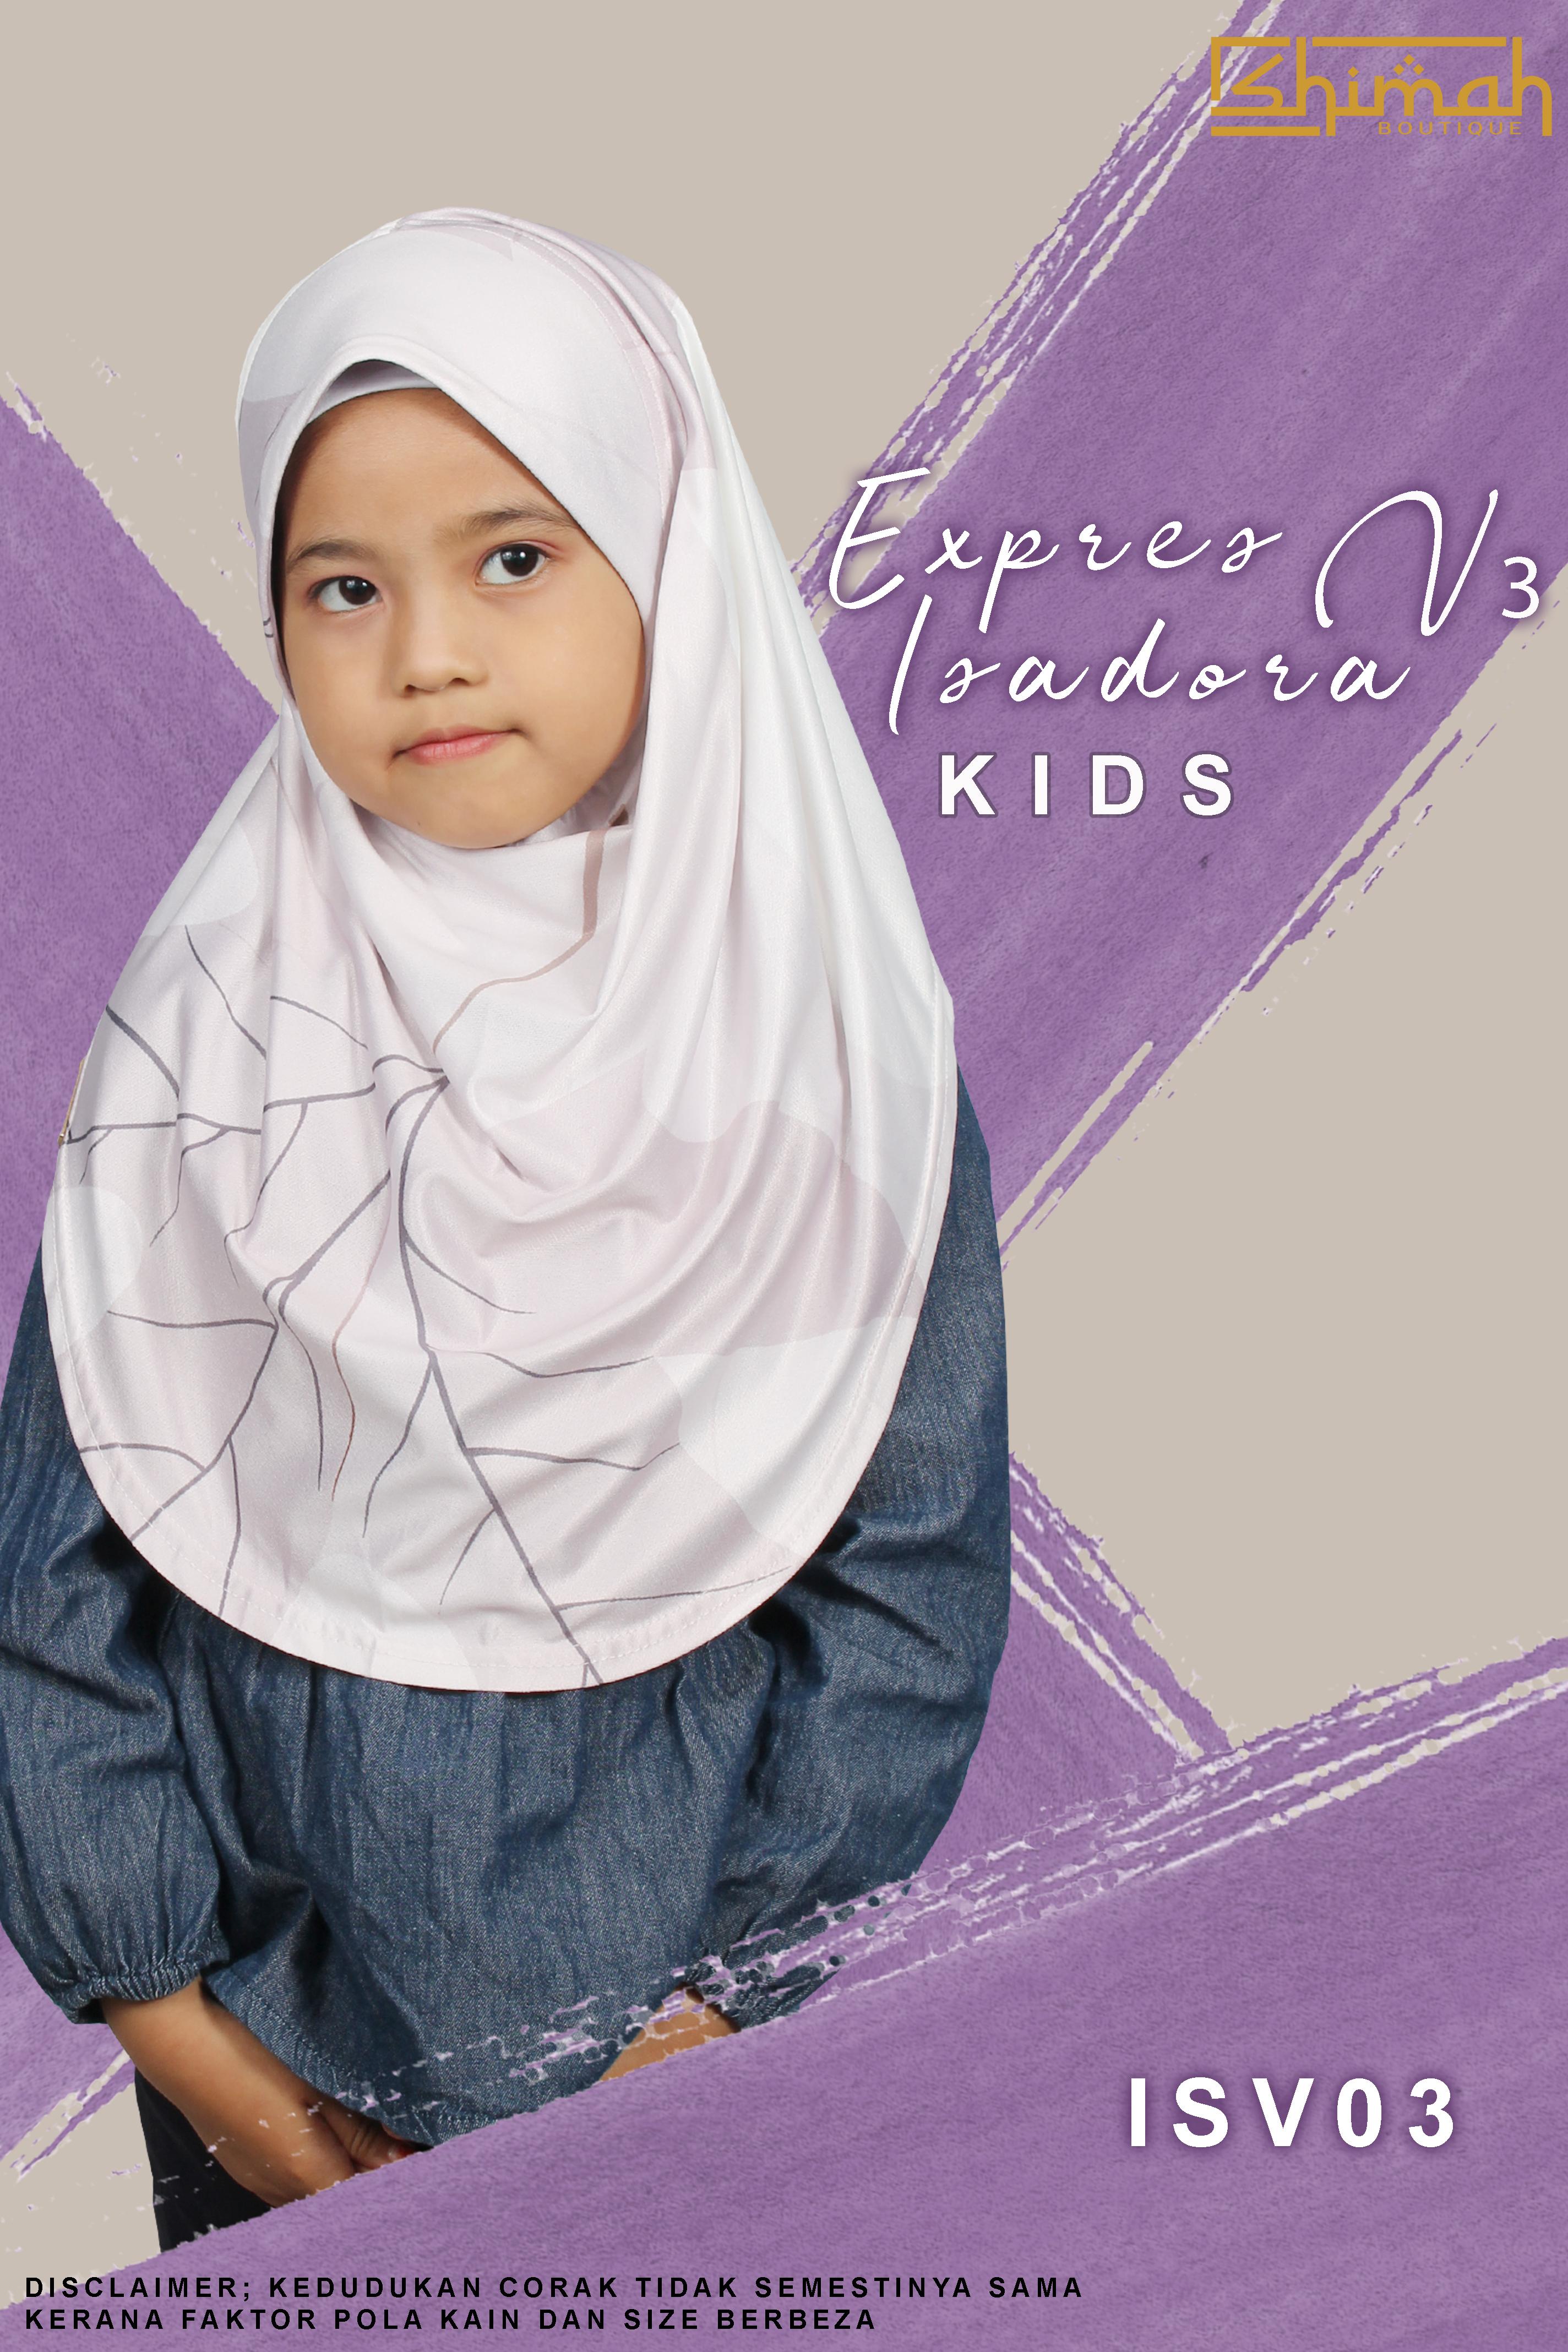 Express Isadora Kids V3 - ISKV03